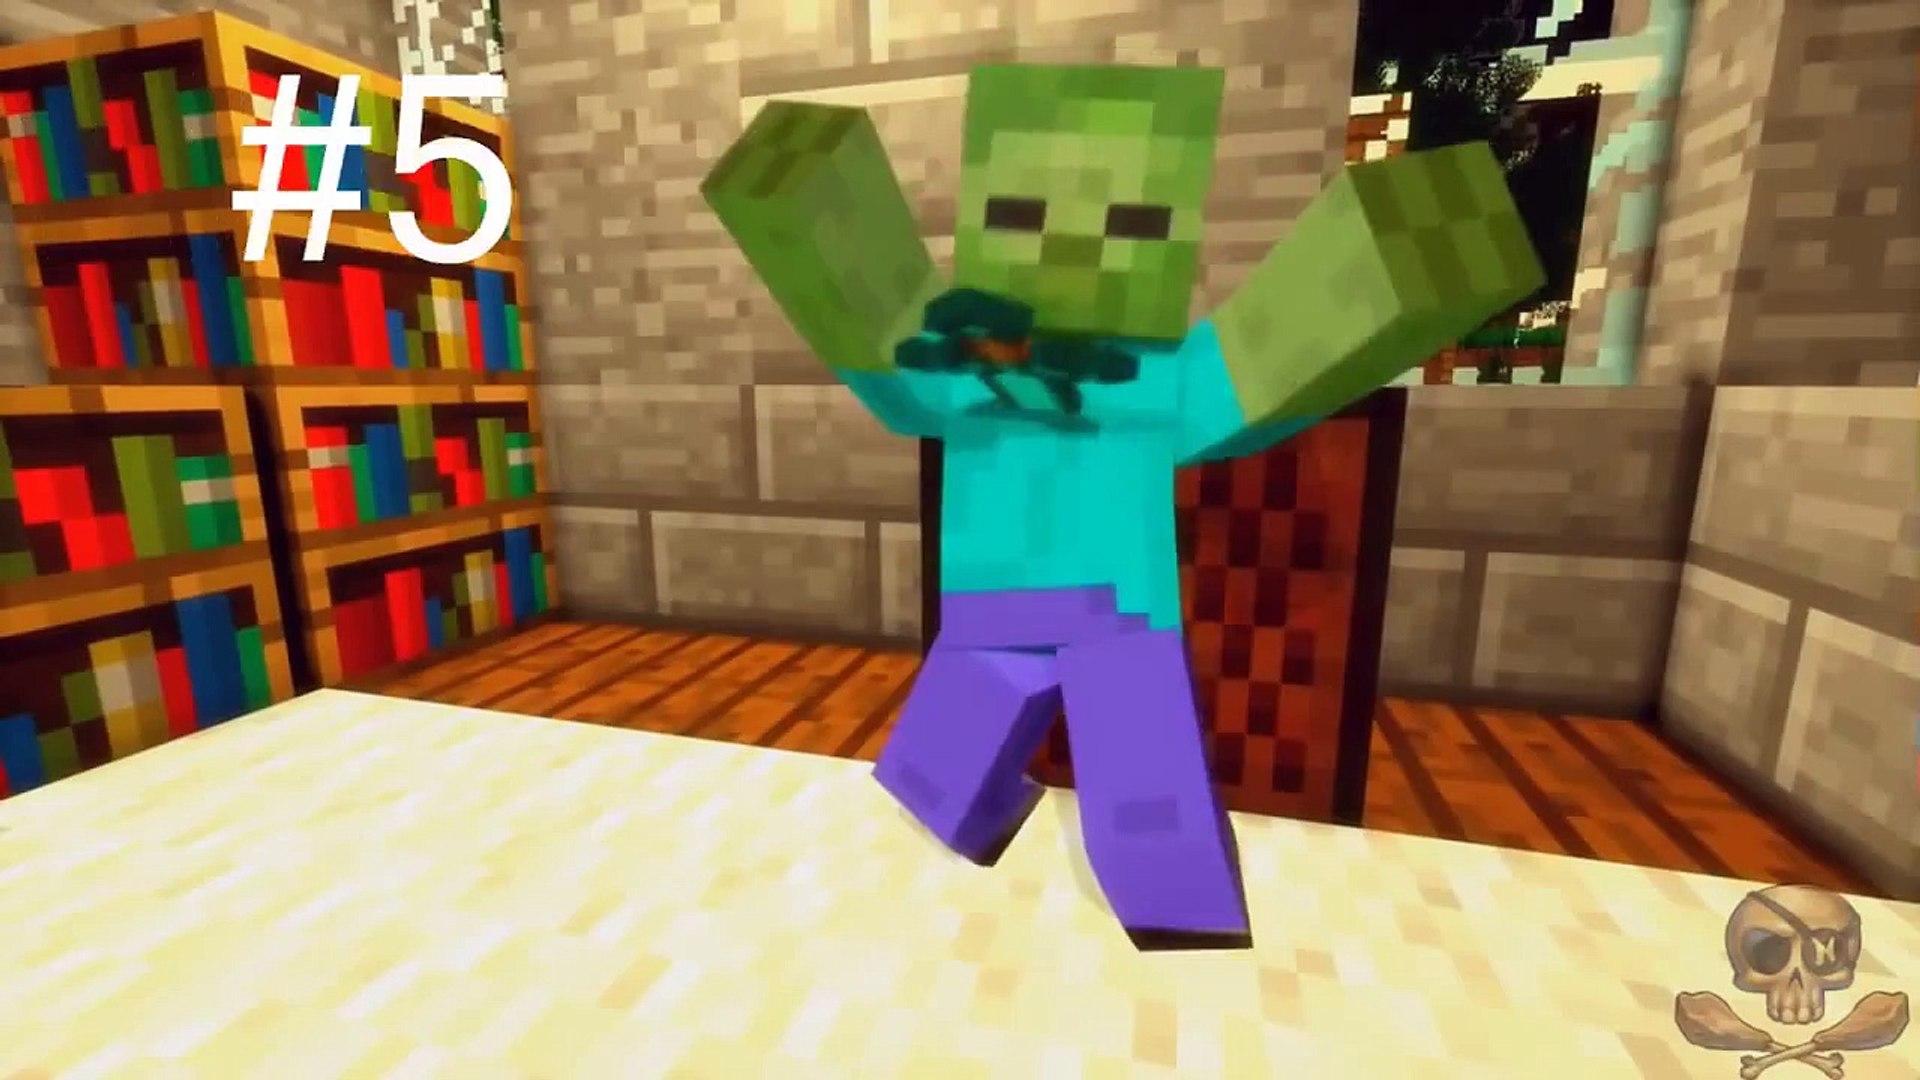 Top 10 Minecraft Songs/Parodies/Animations - Best Minecraft Song/Animation/Parody 2014!